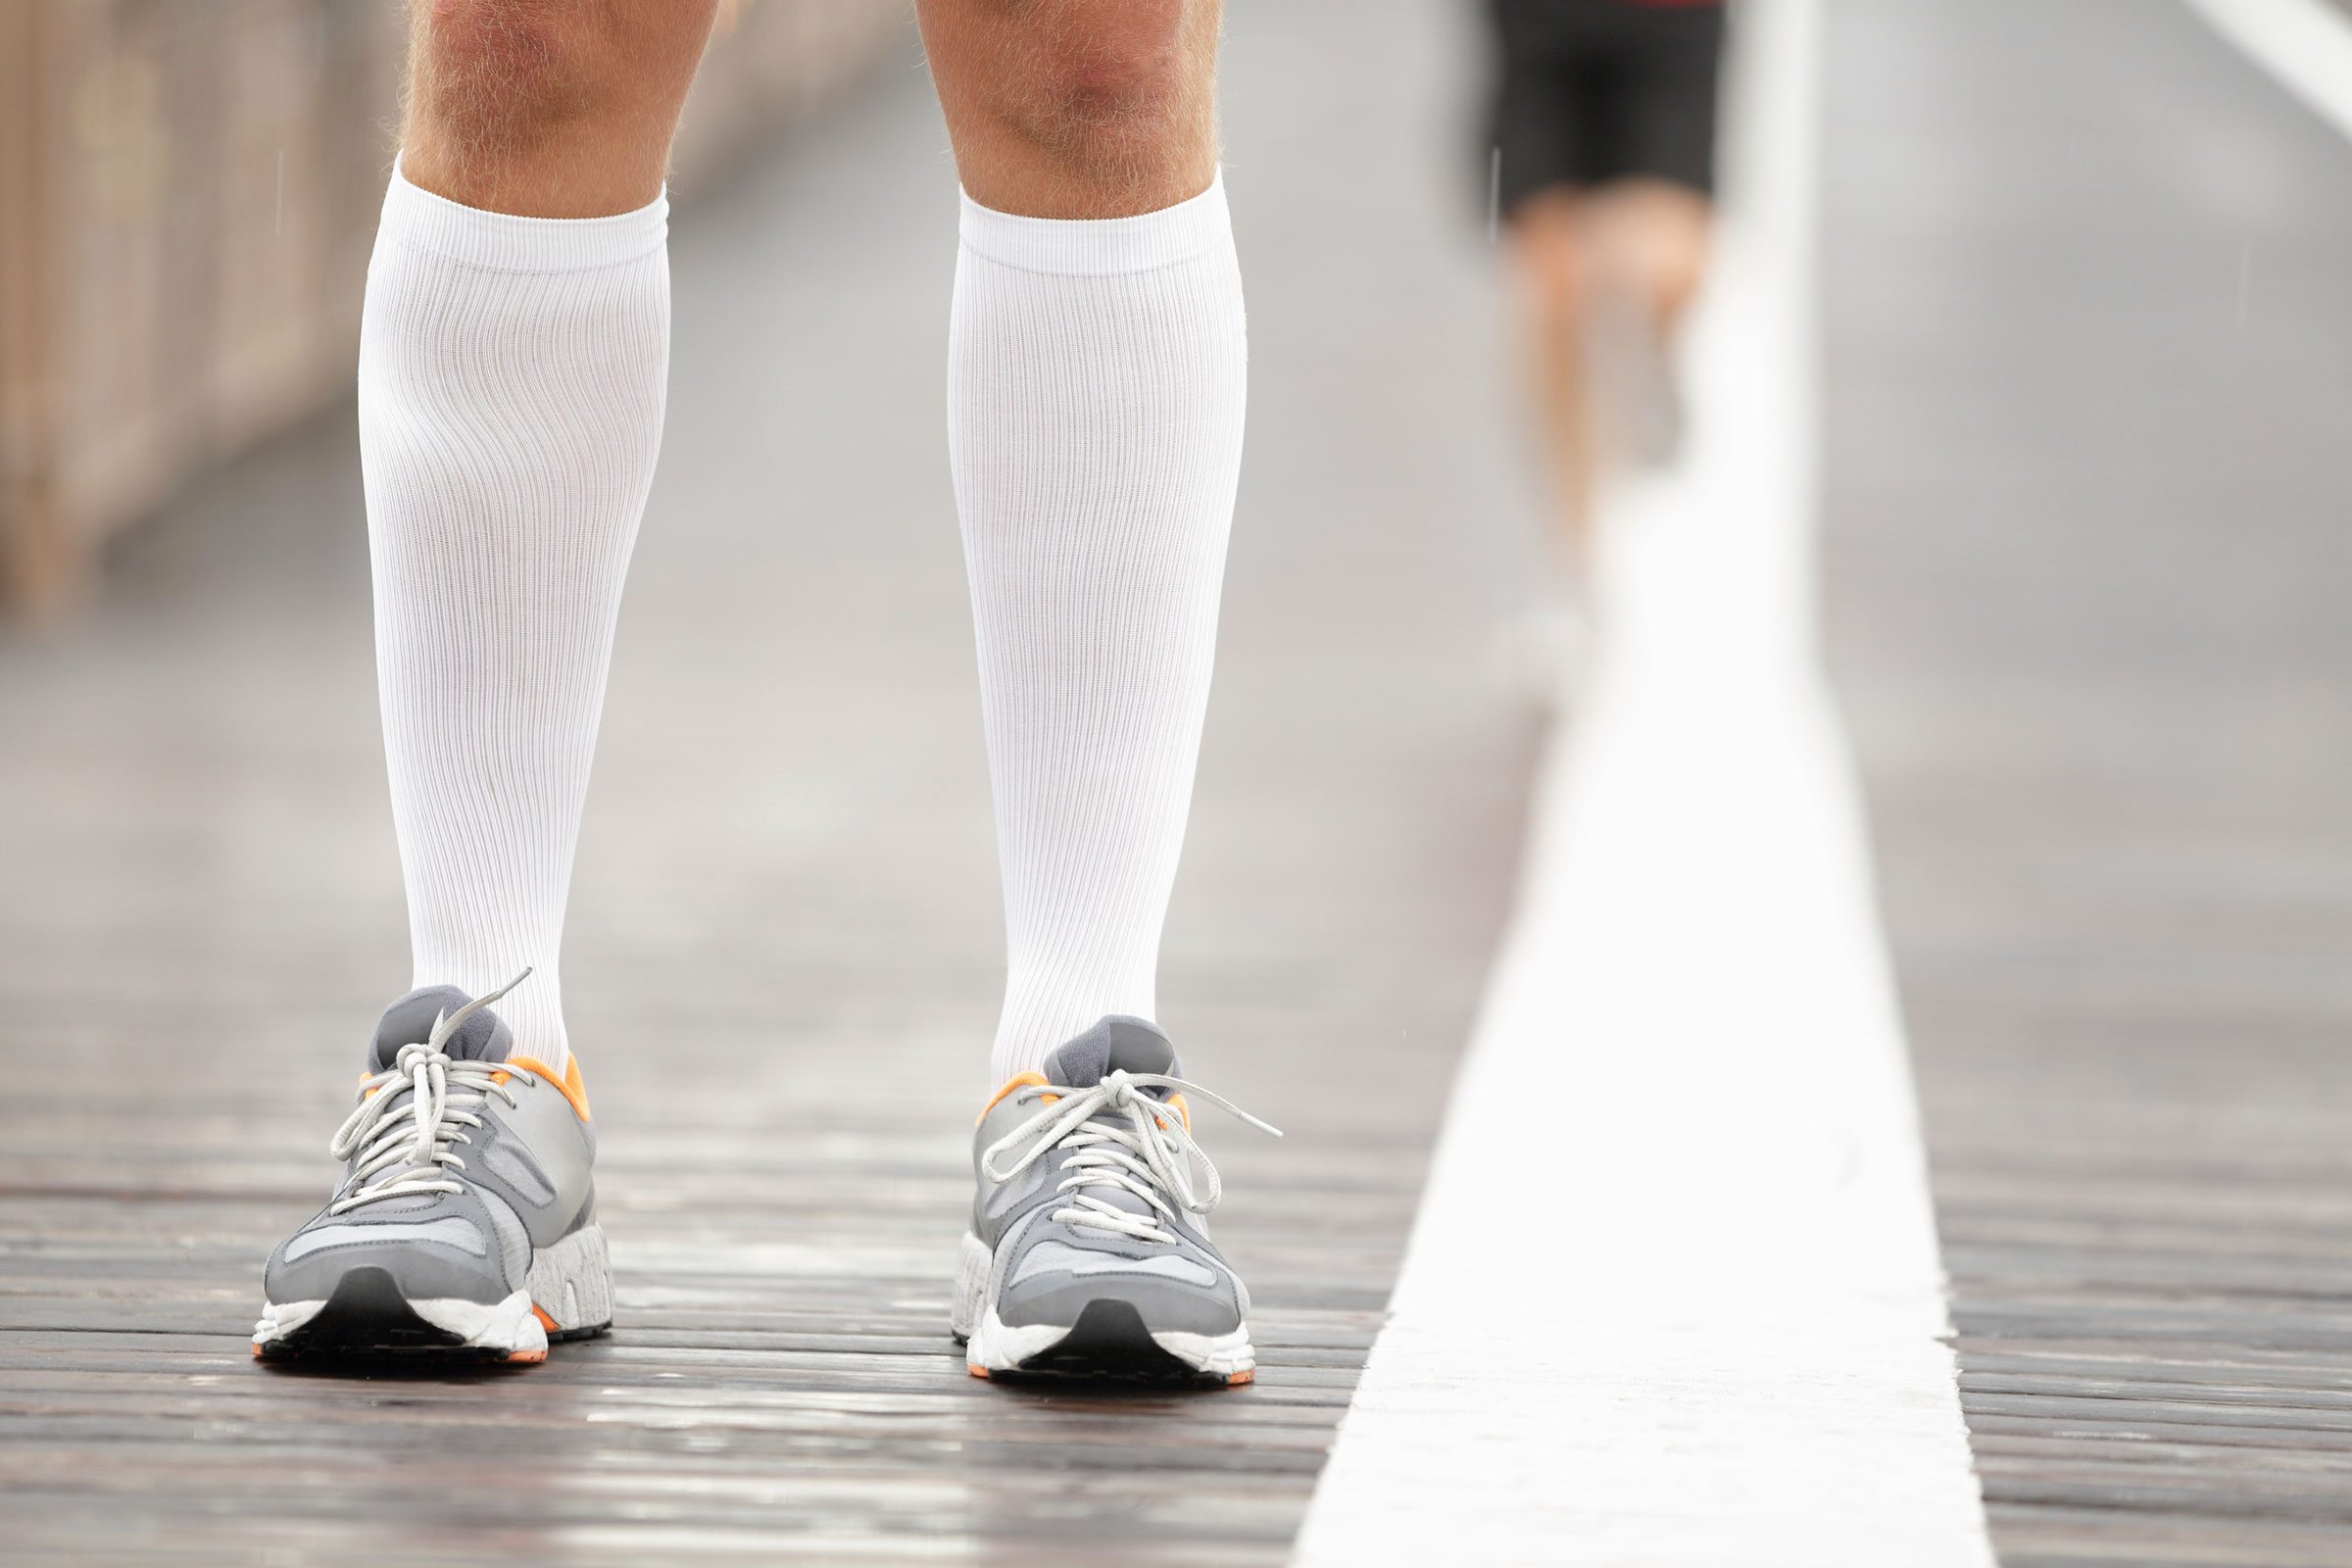 Swollen Feet Natural Home Remedies Readers Digest